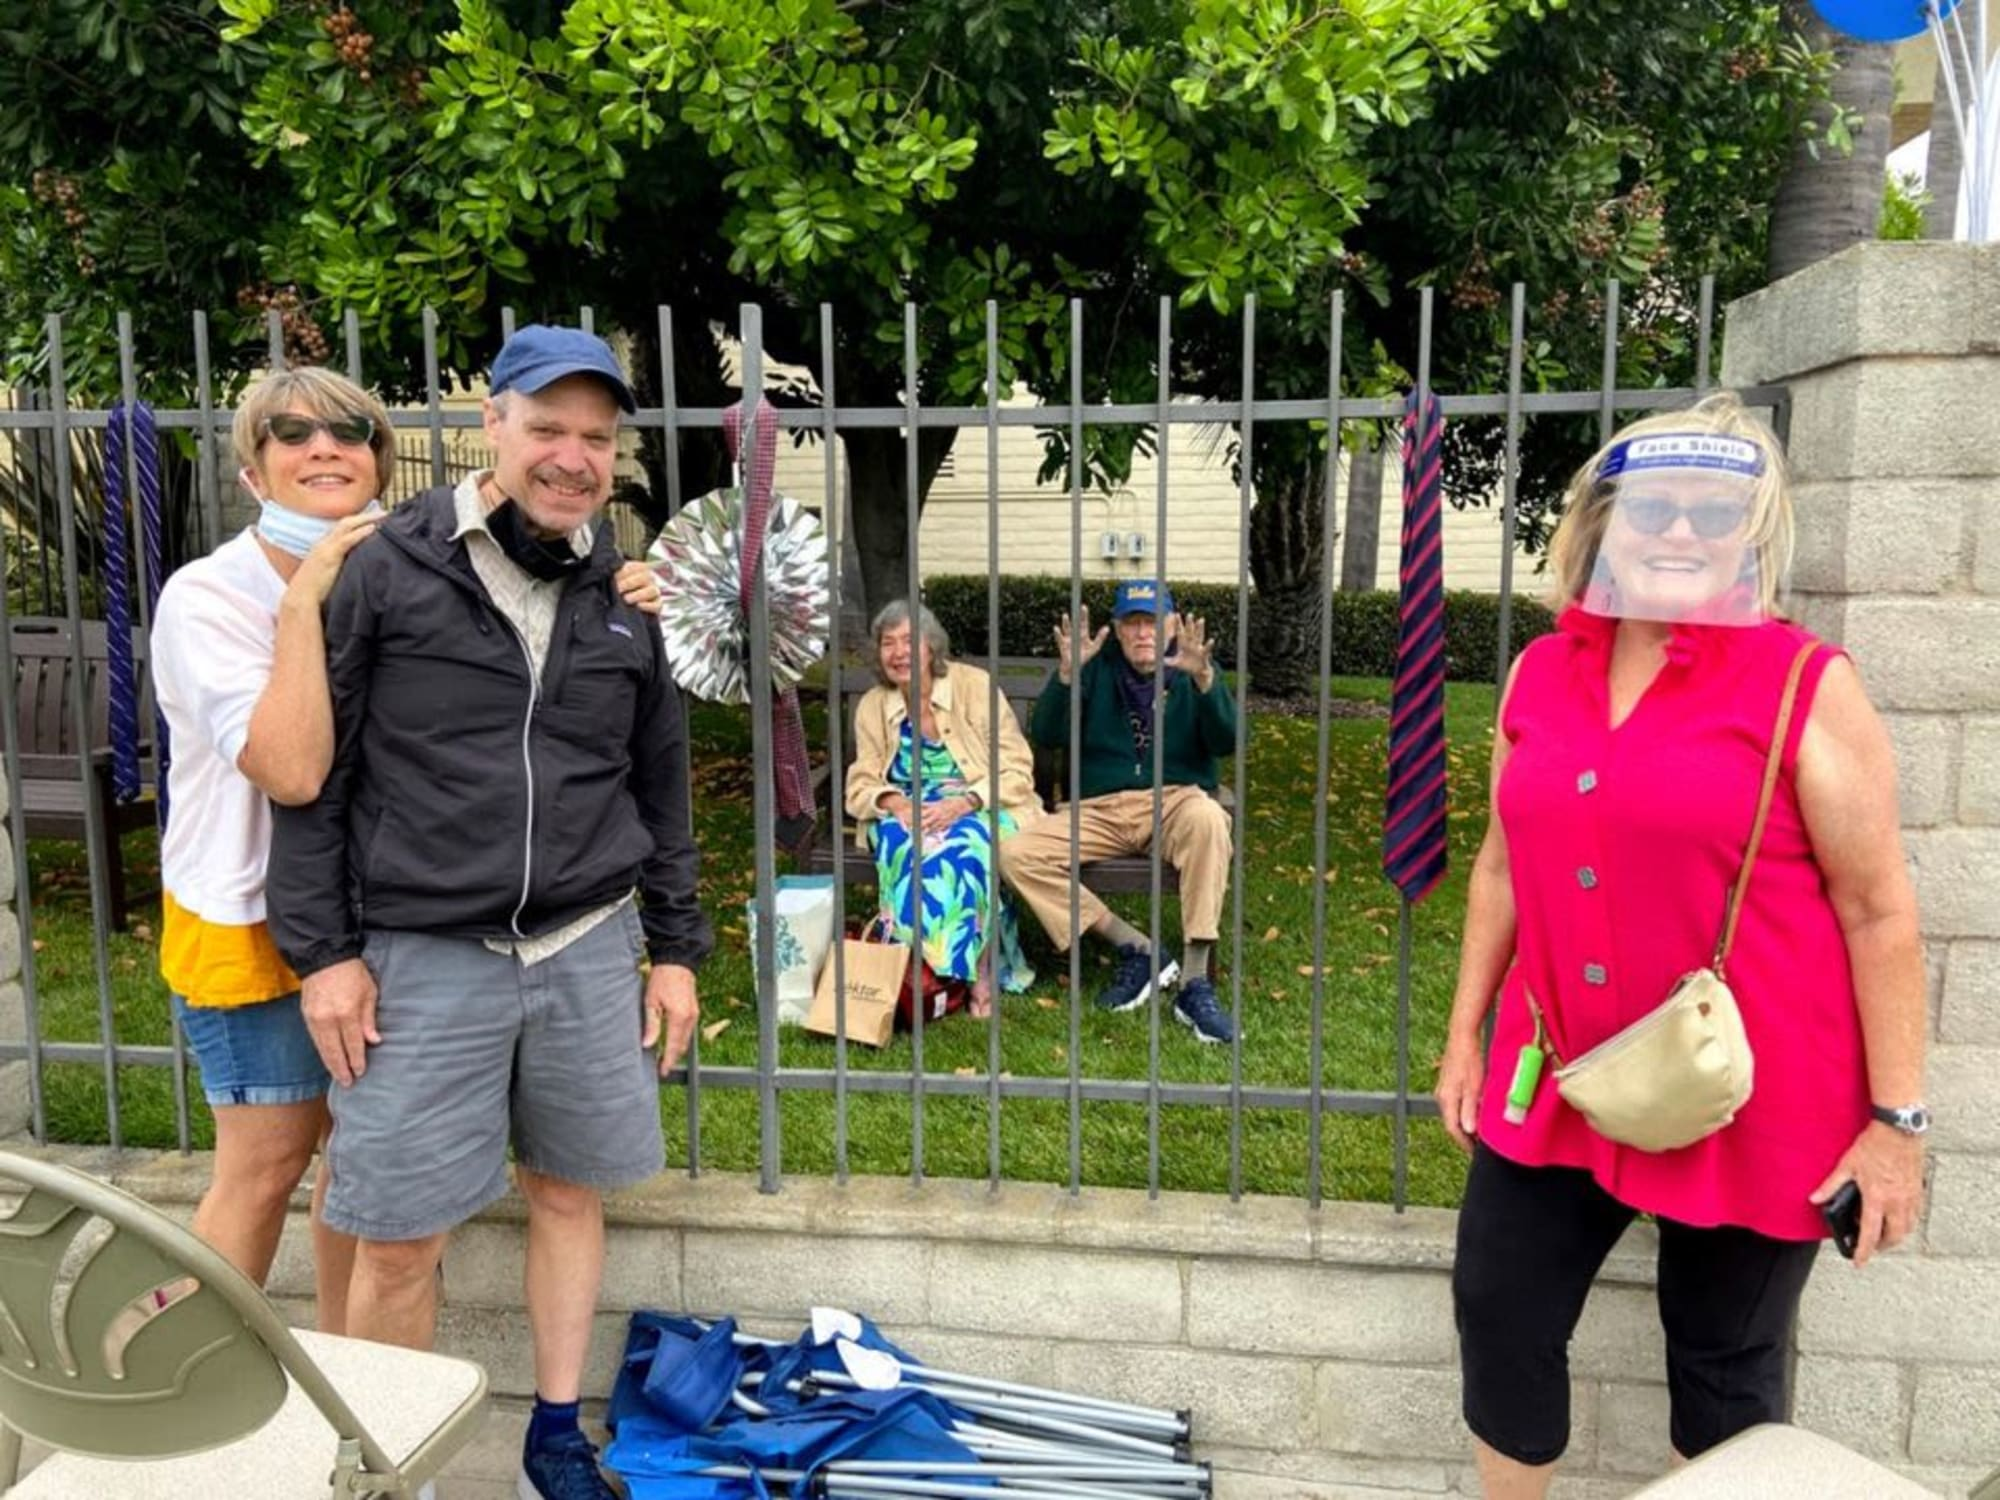 Having visitors at a safe distance at Huntington Terrace in Huntington Beach, California